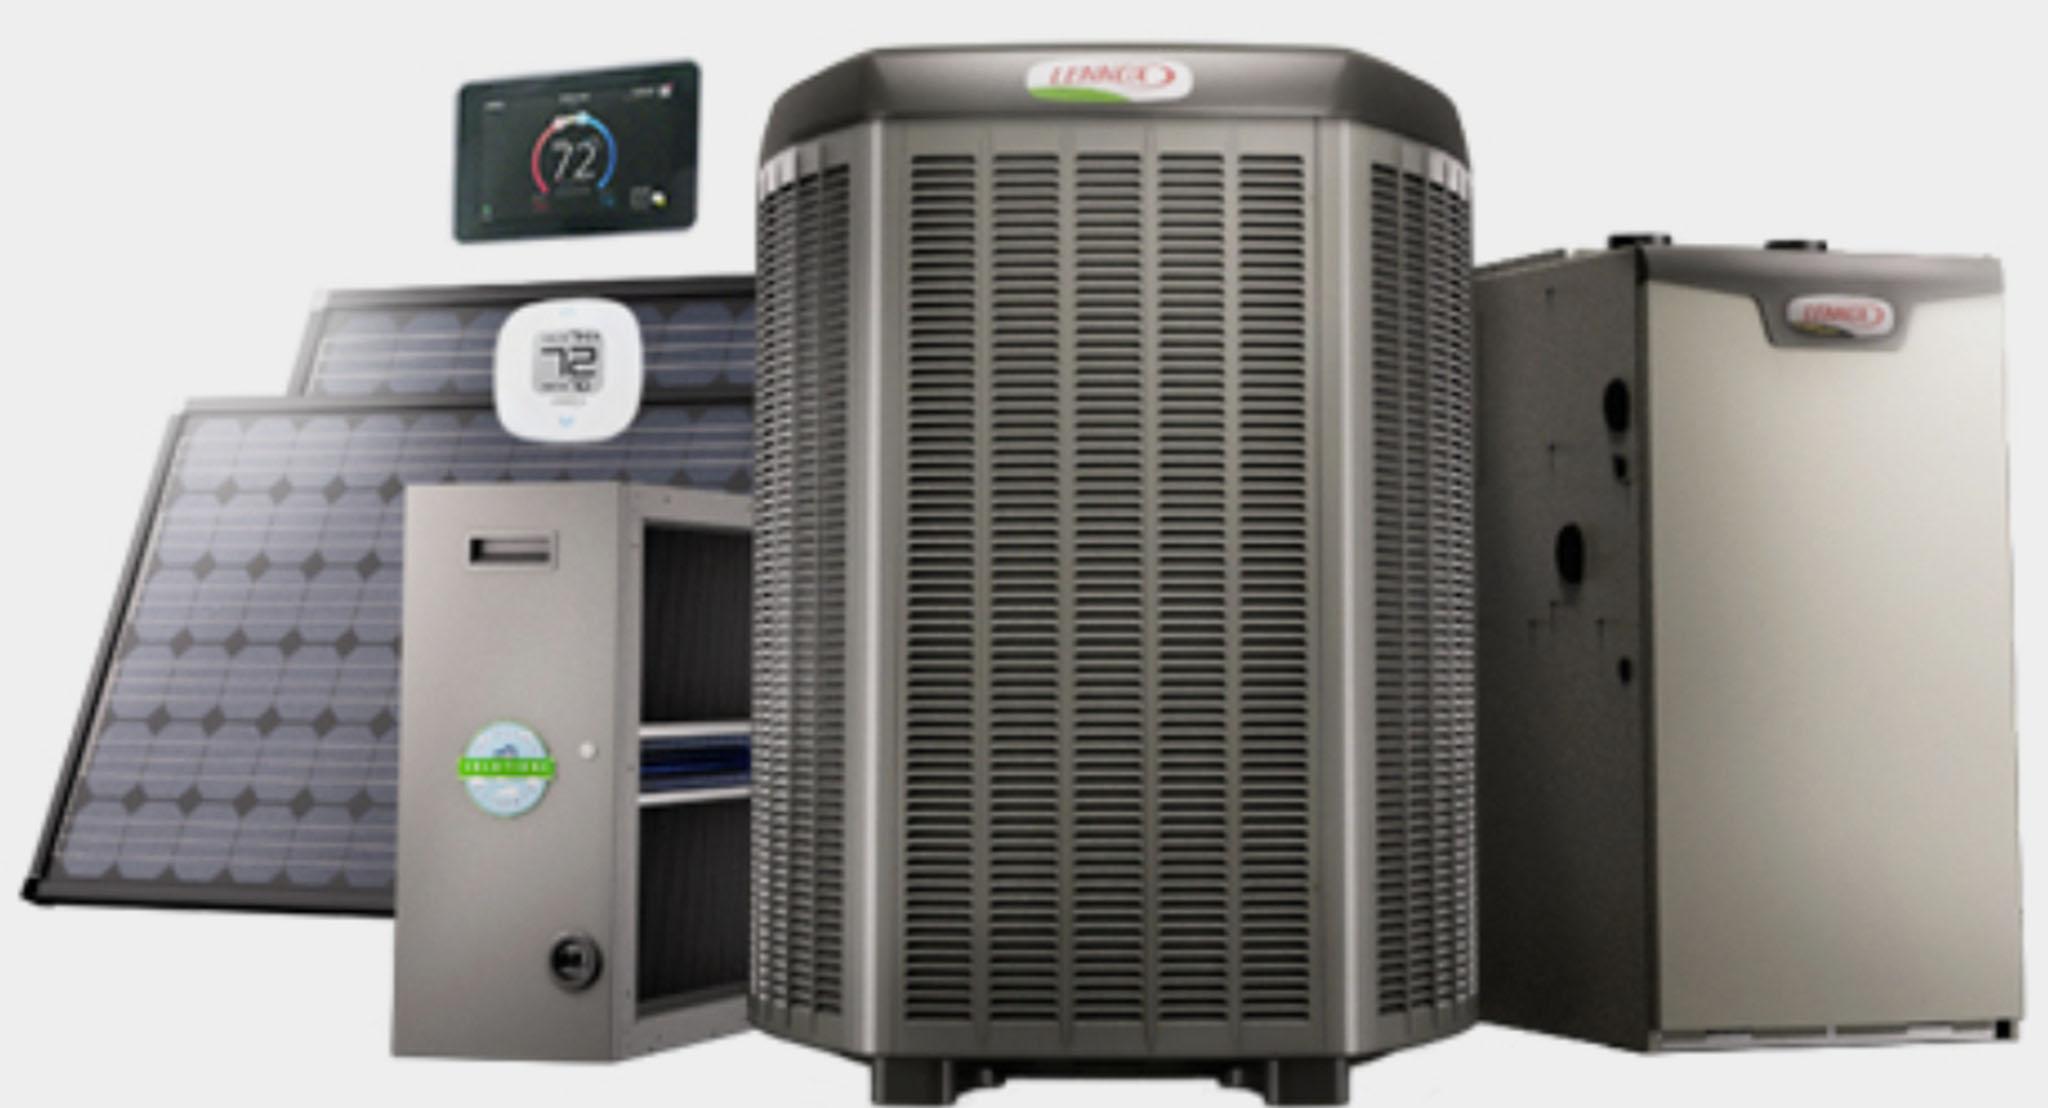 Lennox central air conditioner model number goodman for Lennox program